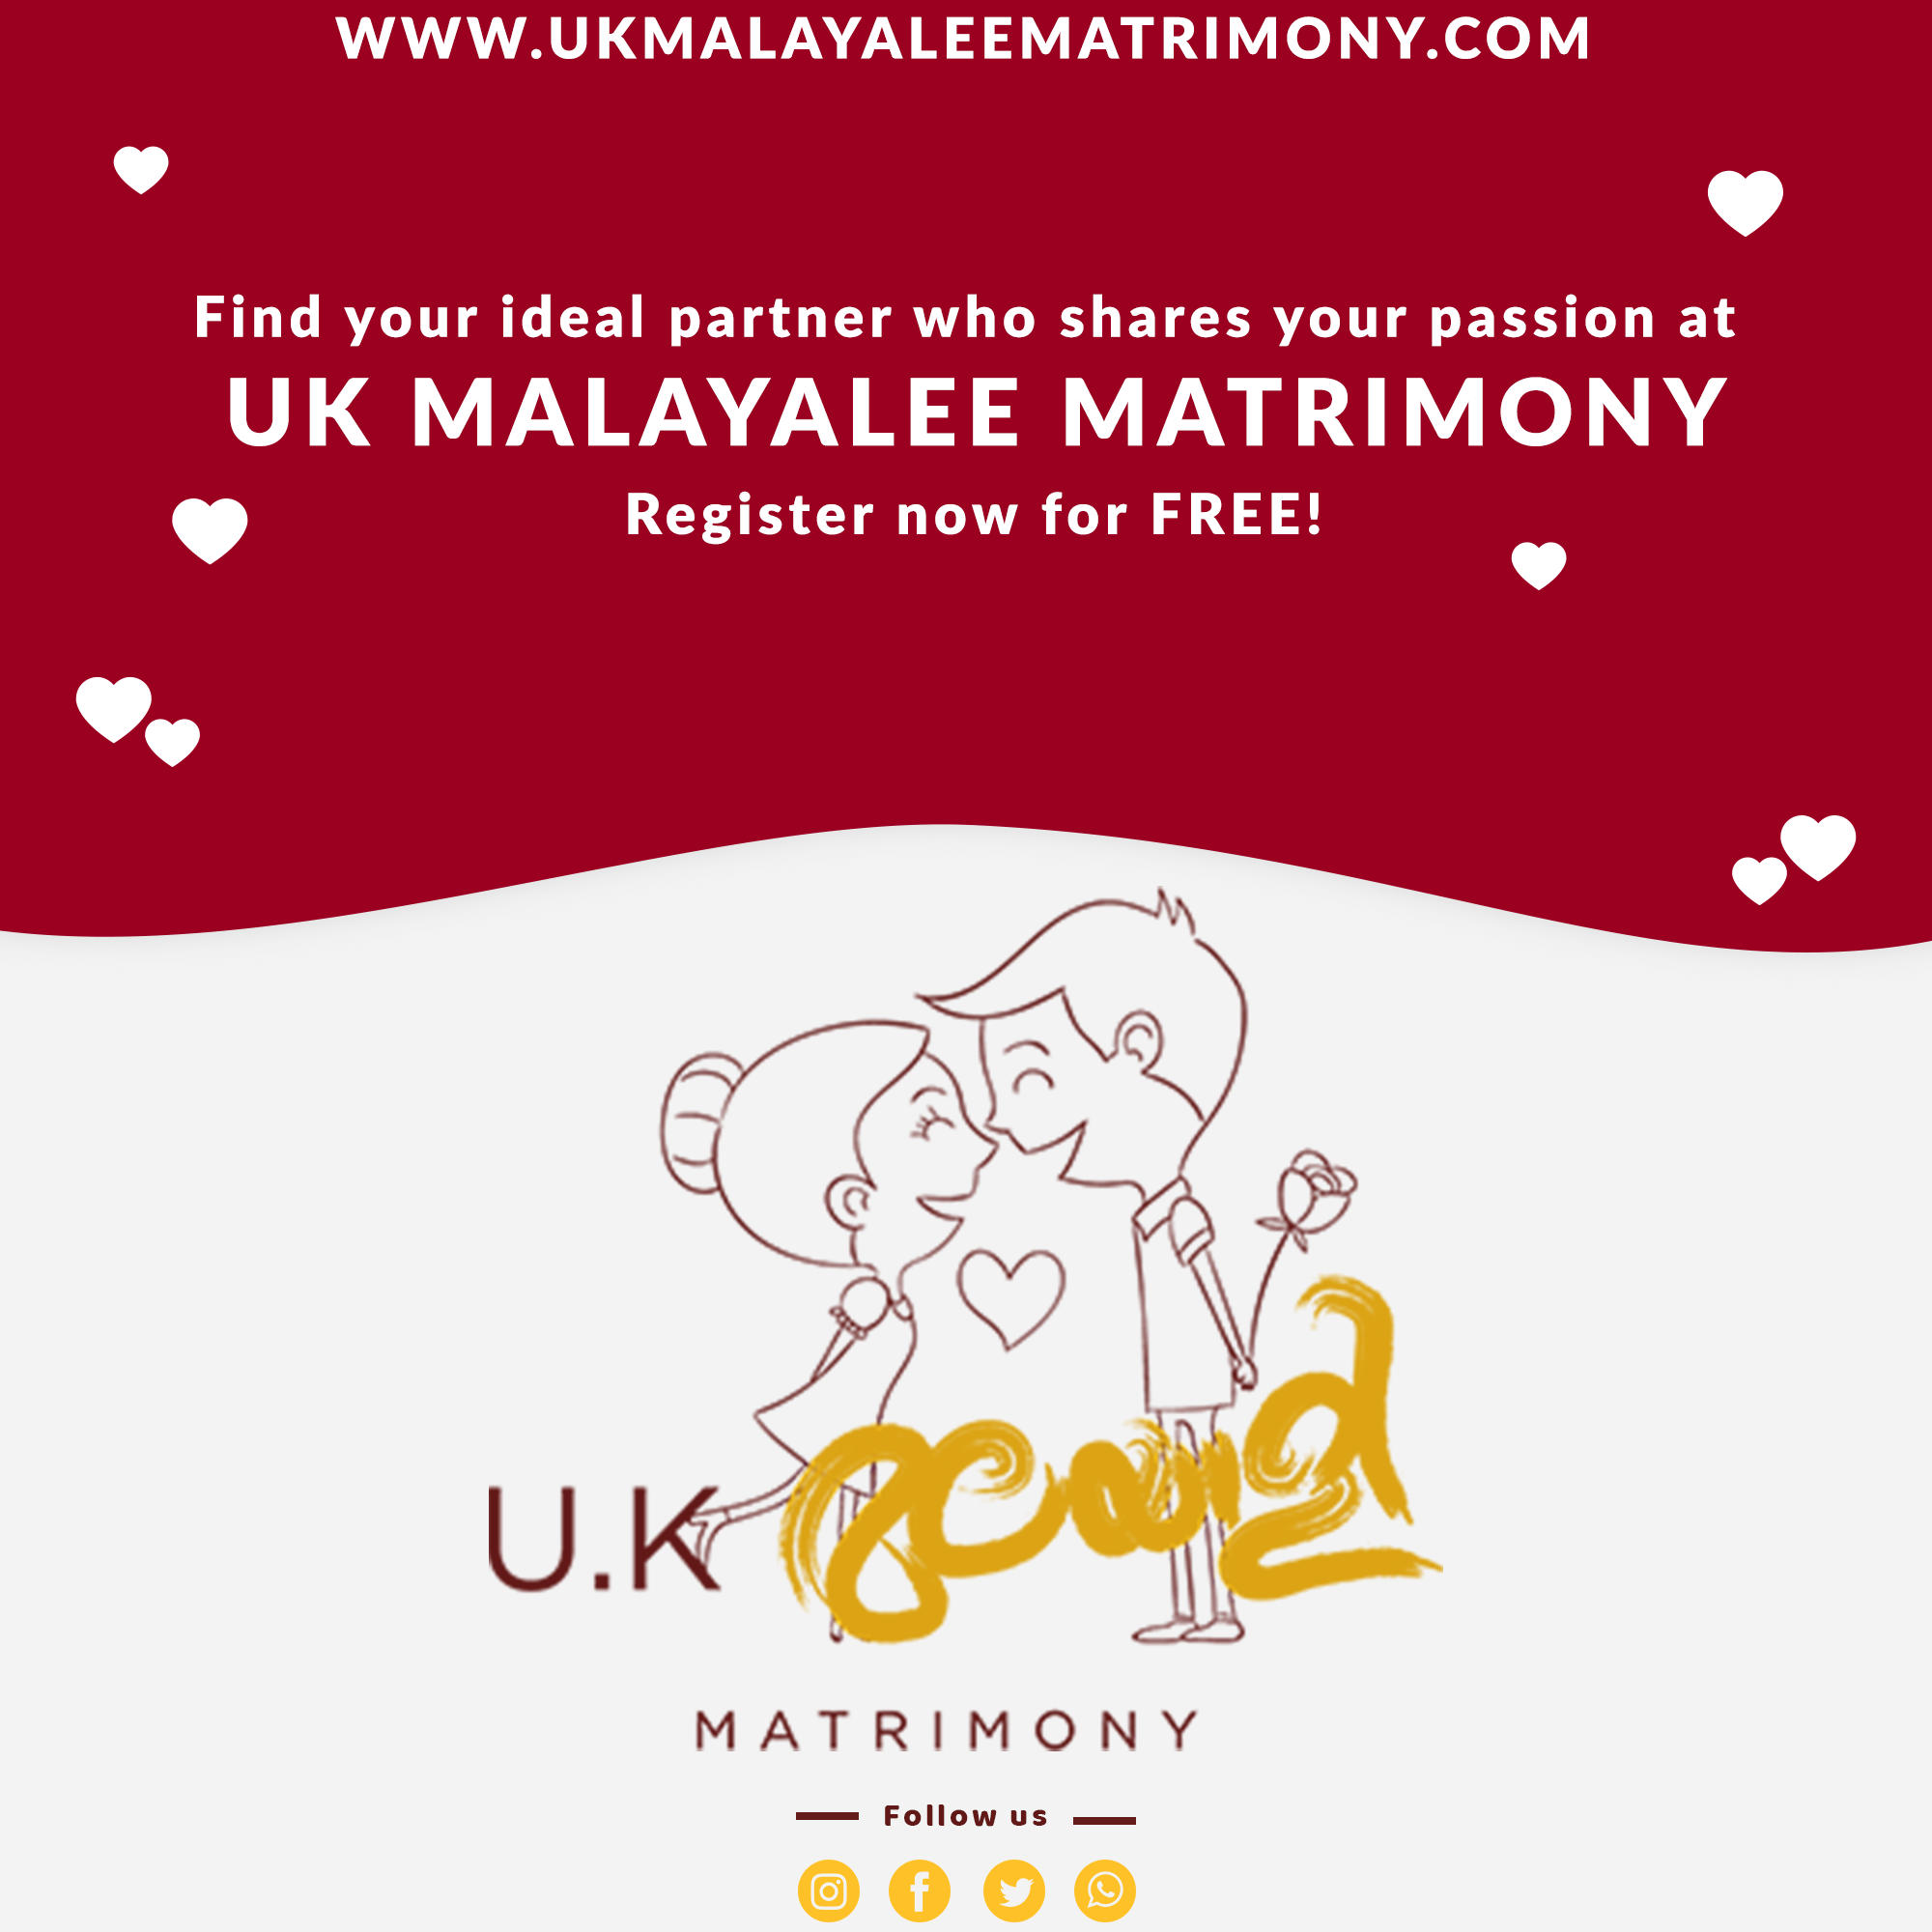 How to register on British Malayali Matrimony